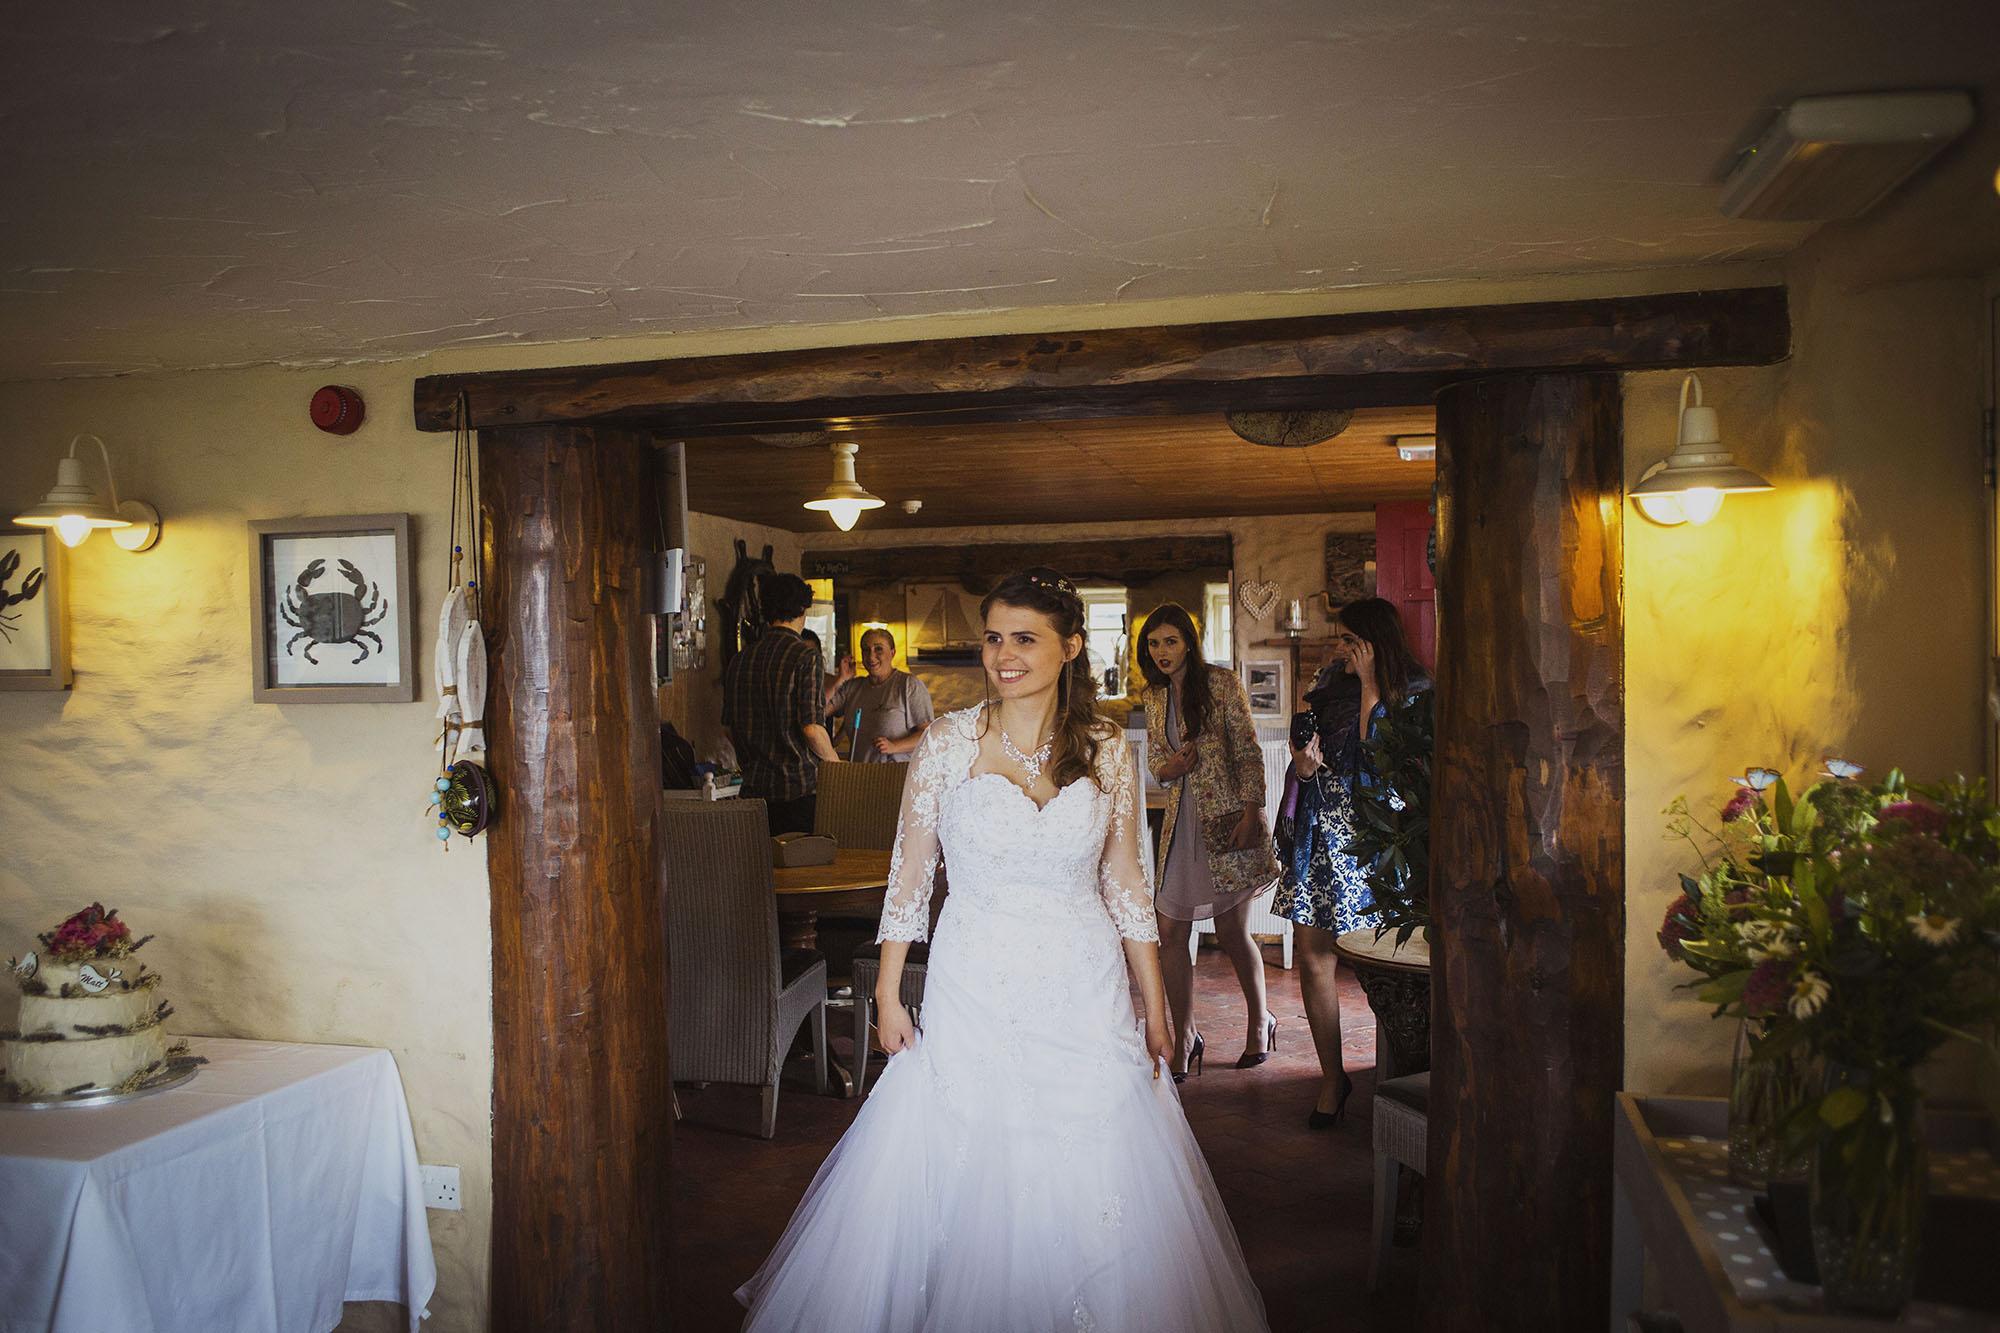 bride entering wedding dinner at the old sailors dinas cross newport pembrokeshire